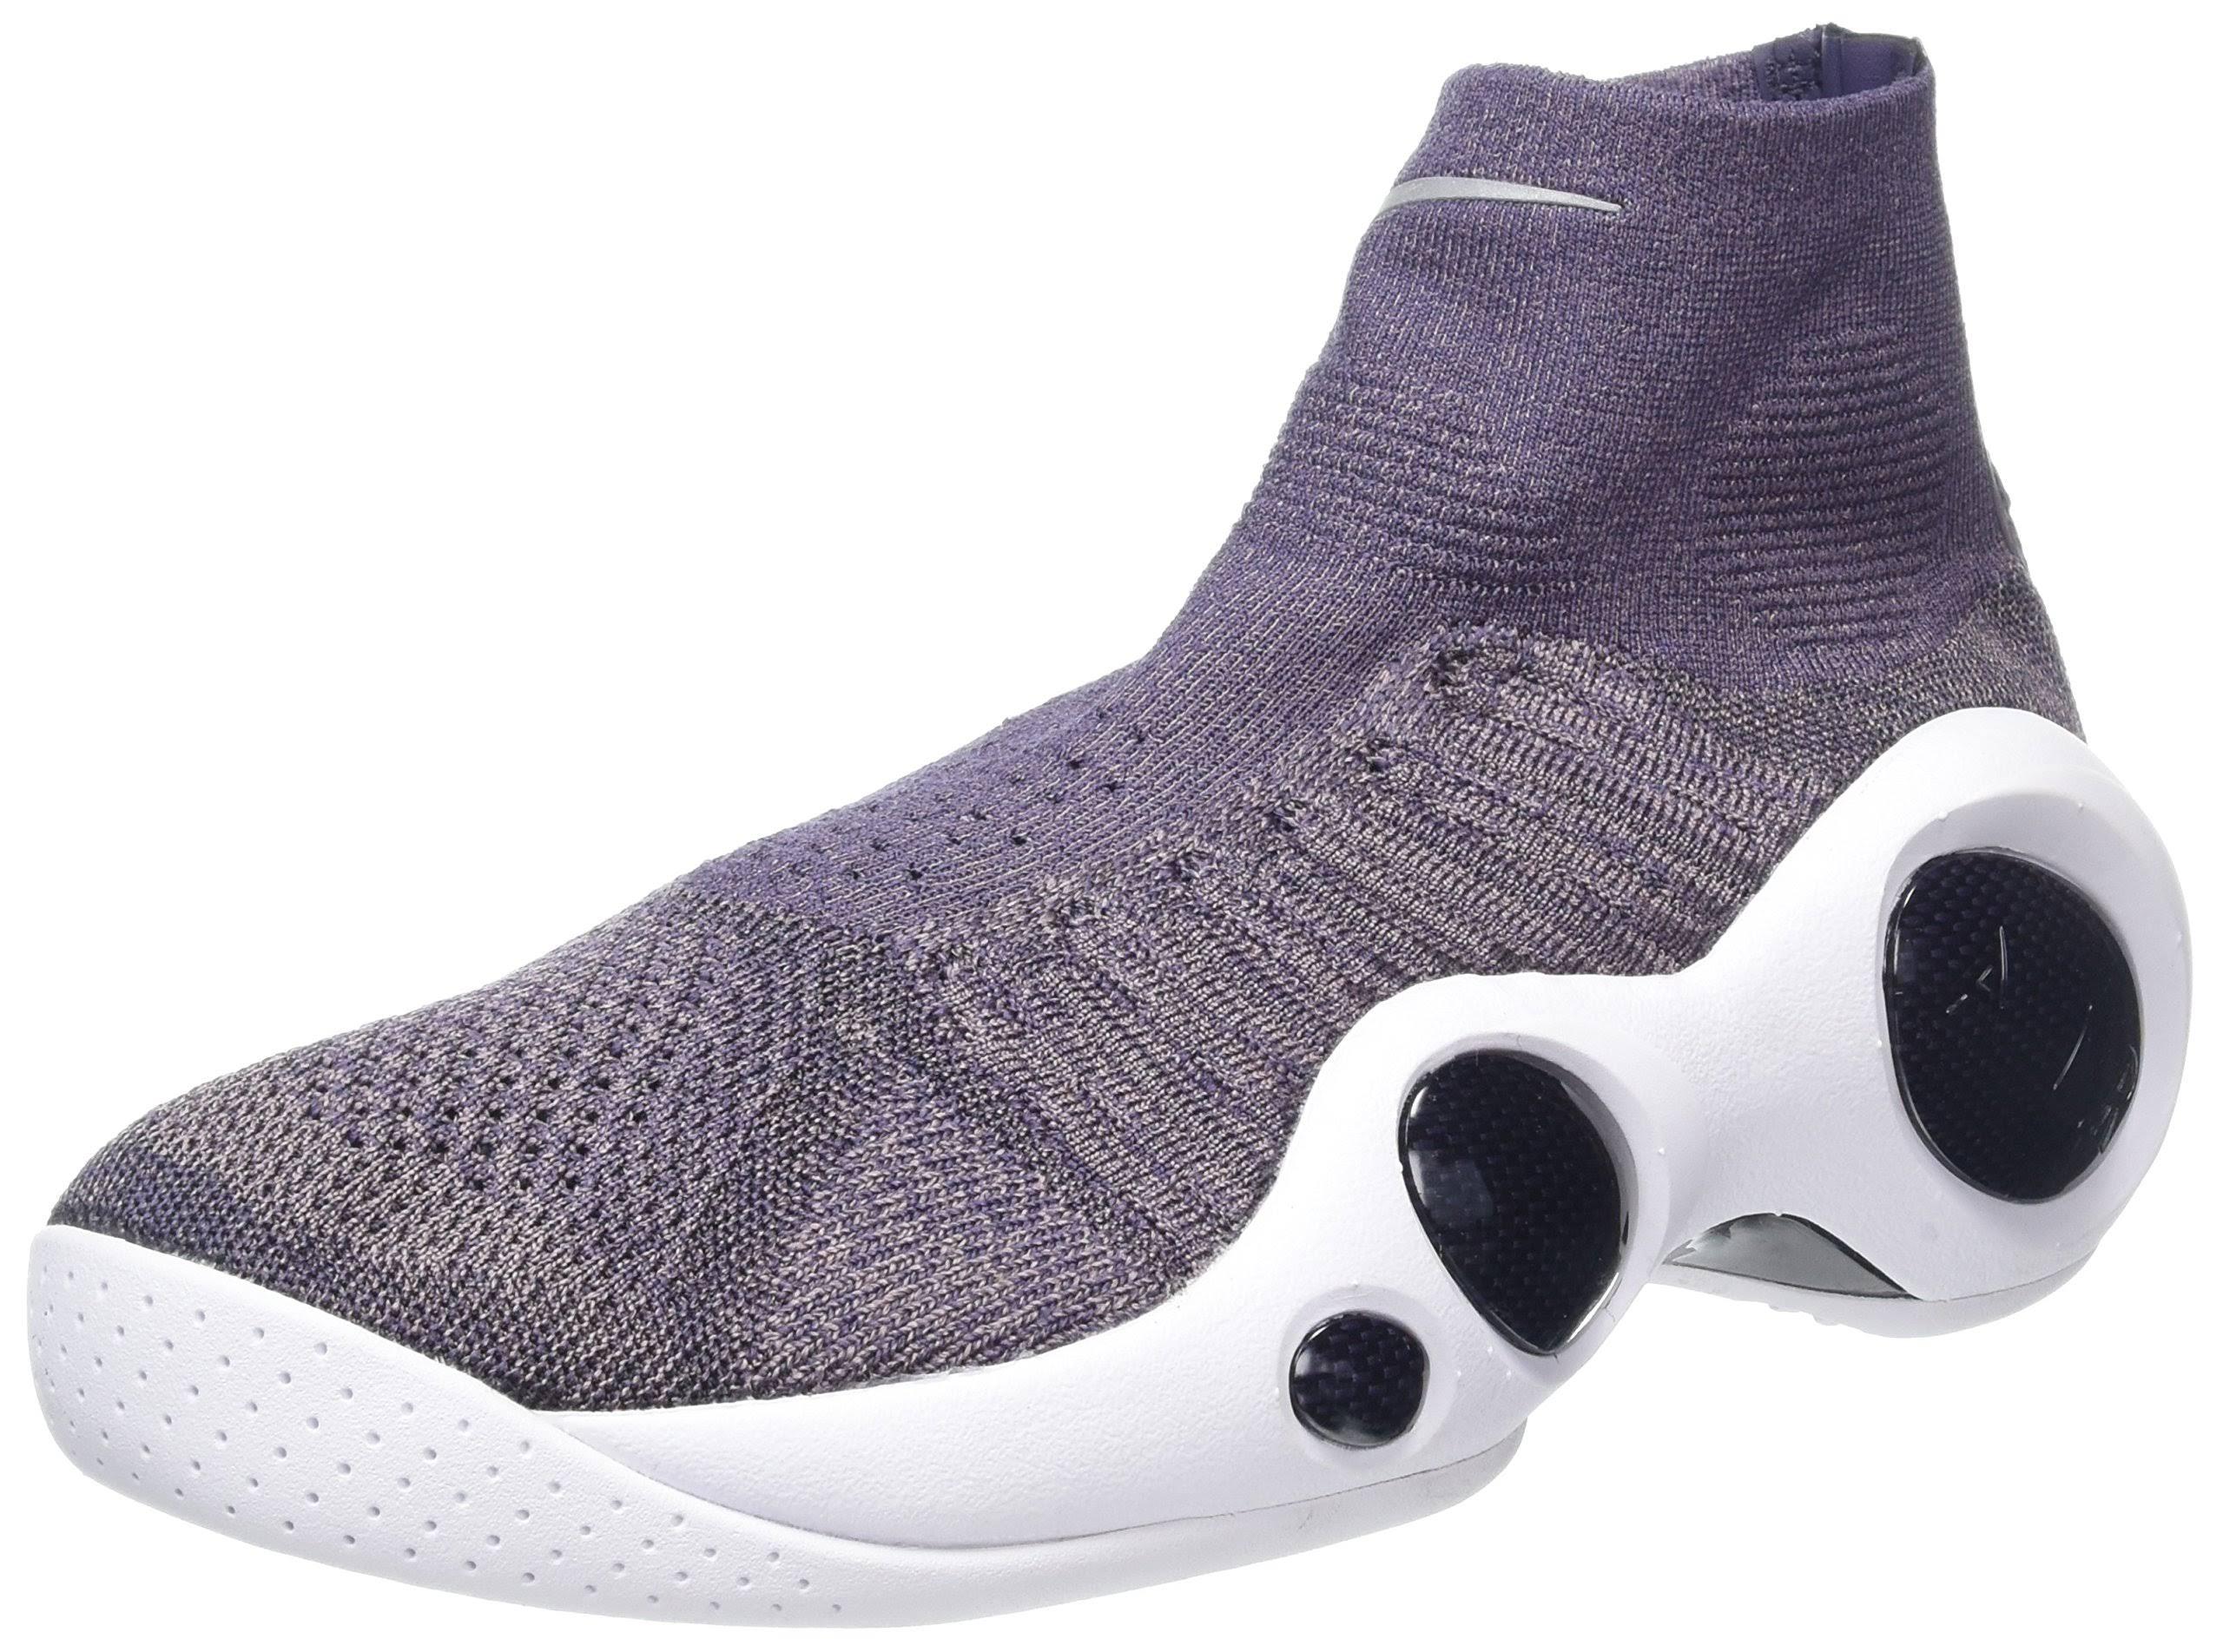 8 Grey 5 Men's Nike Purple Basketball Taupe Shoe Men Bonafide Raisin Flight Us dark qznIaBw